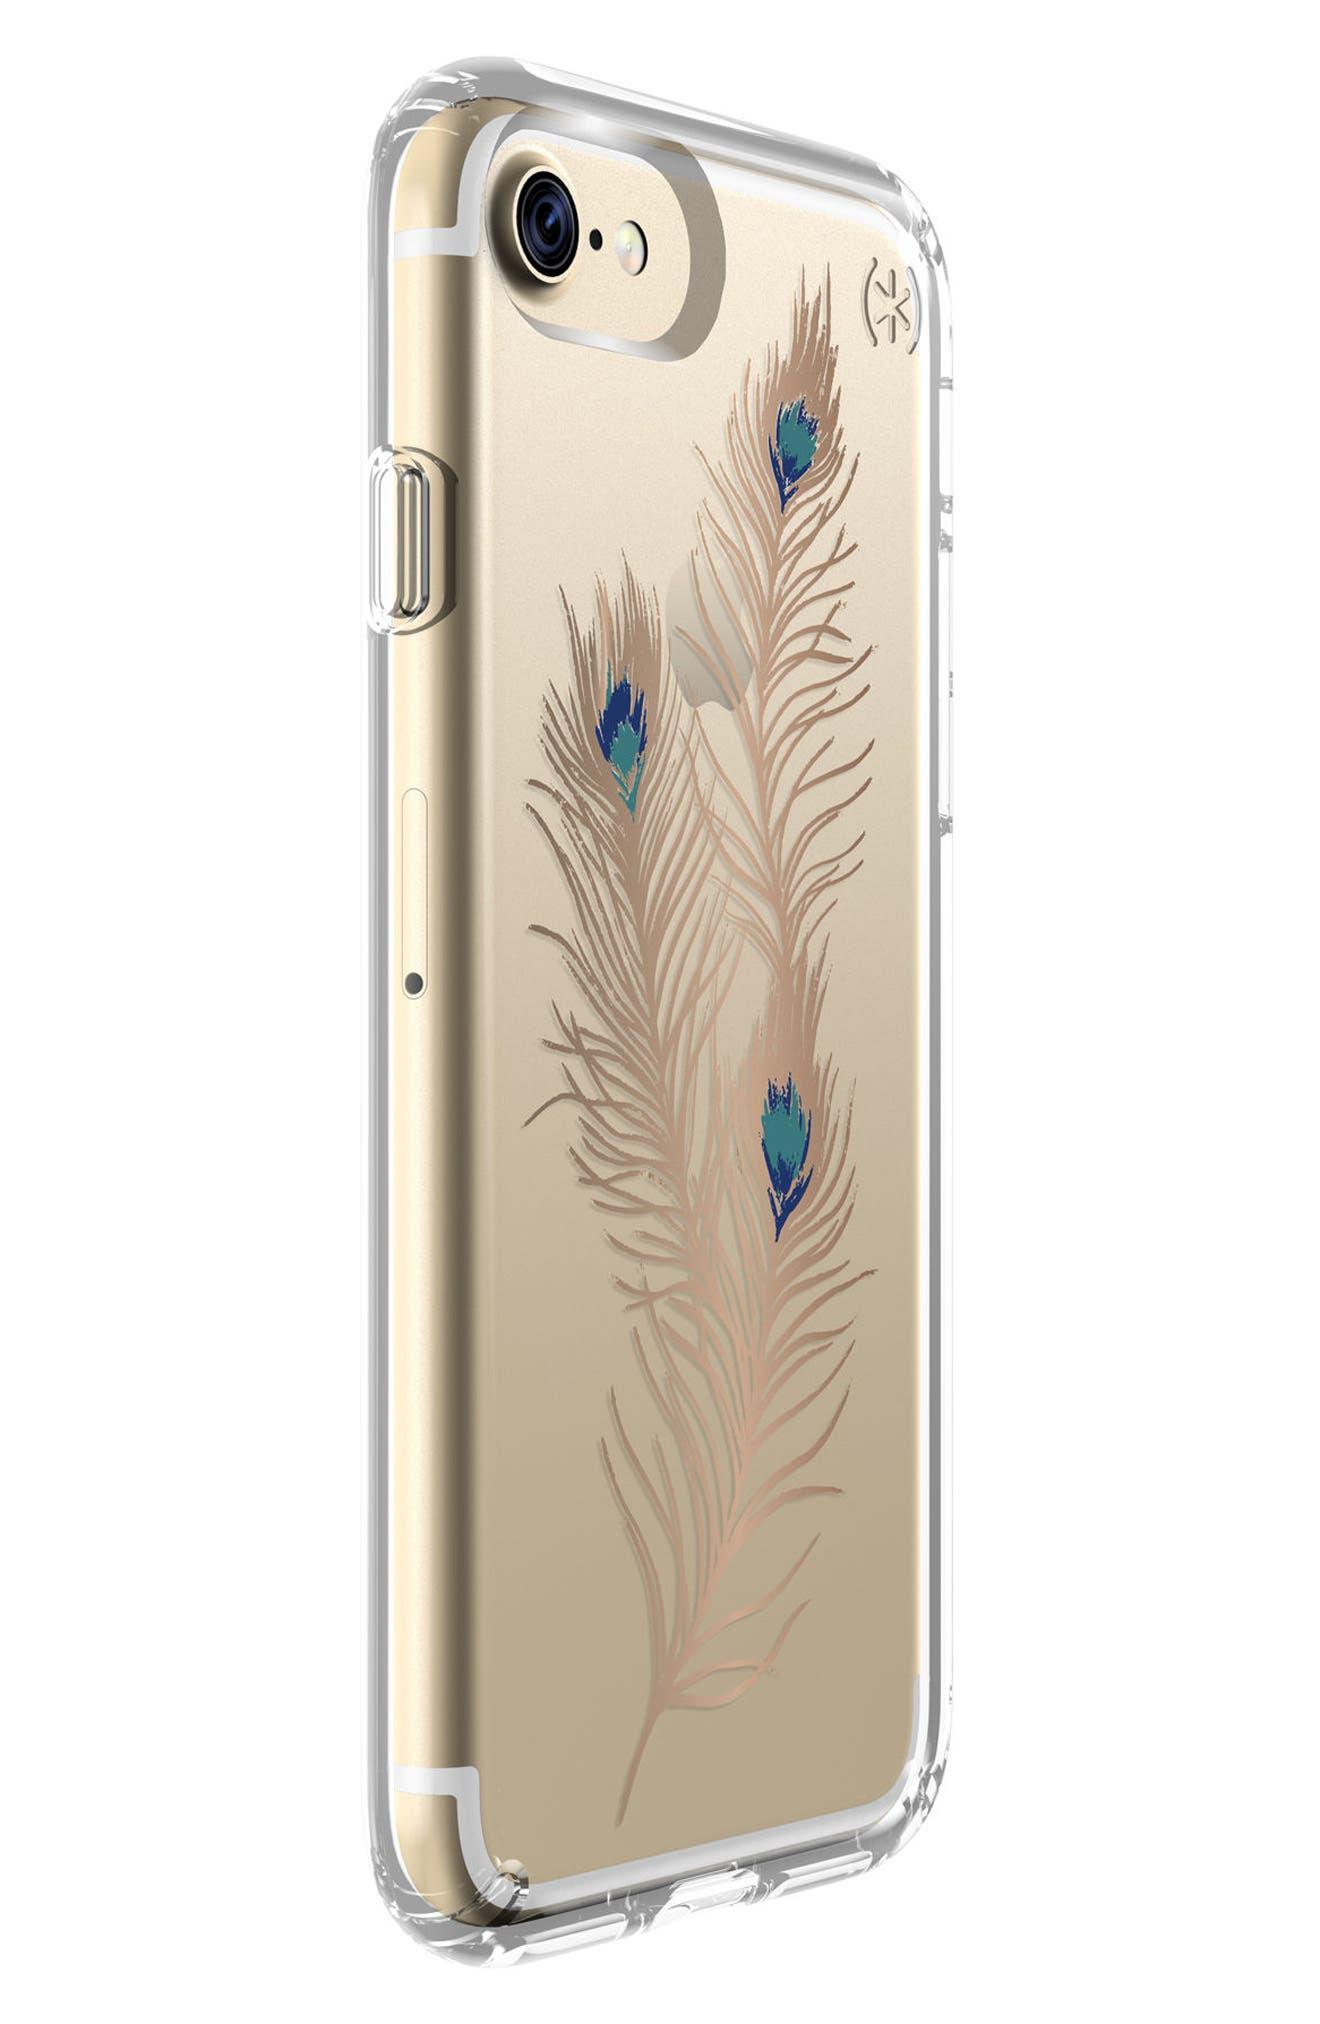 Main Image - Speck Presidio Clear iPhone 6/6s/7/8 Case